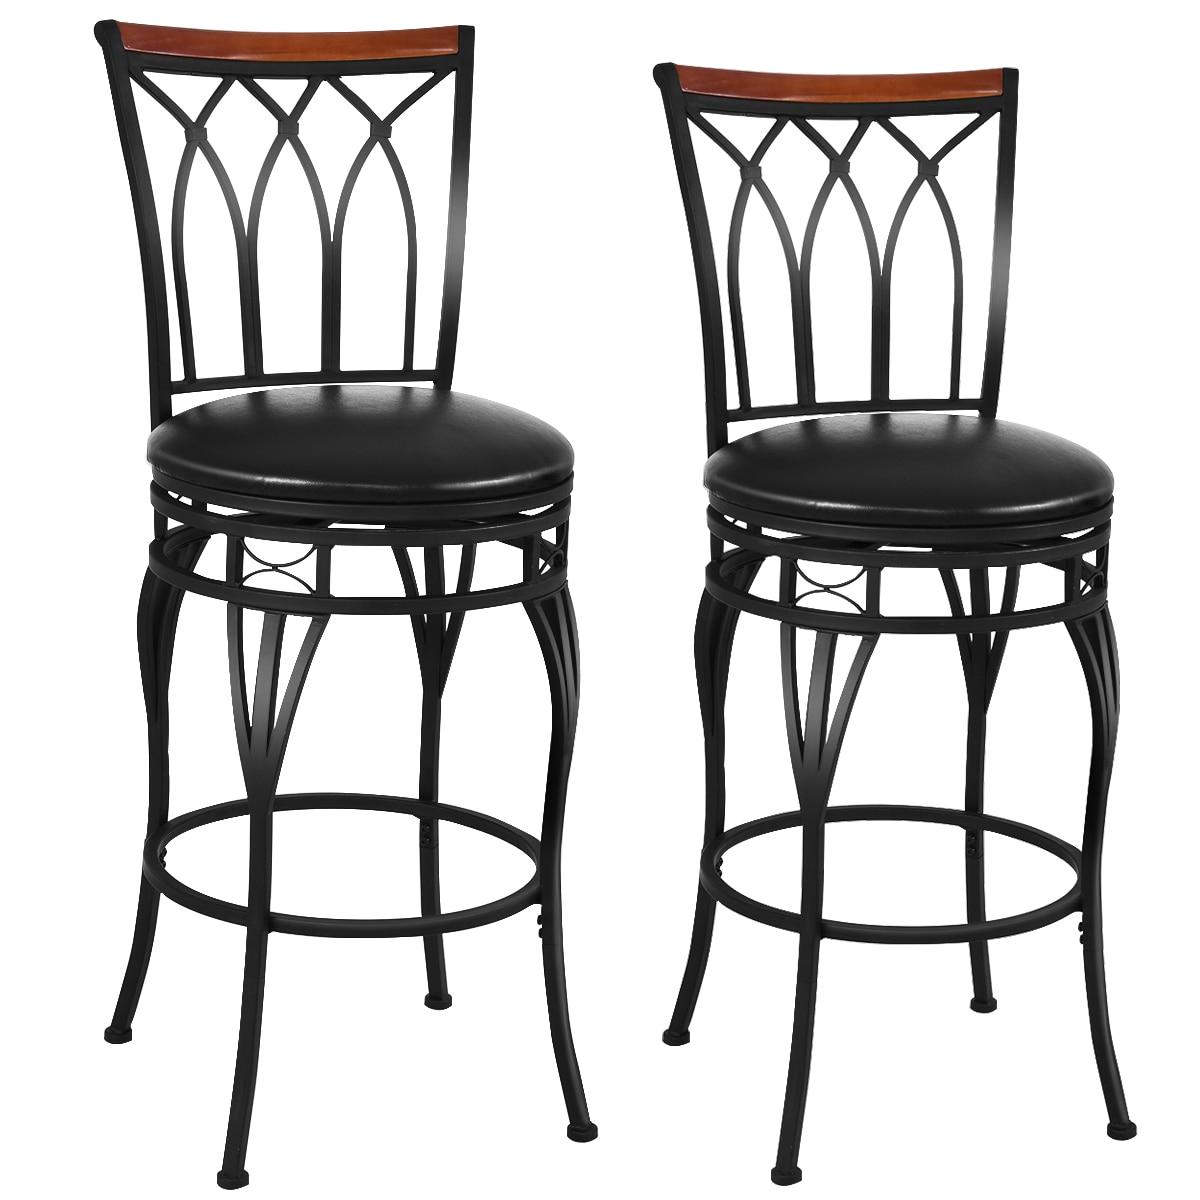 Costway Set Of 2 Vintage Bar Stool 24'' 28.5'' Height Adjustable Bistro Pub Chair